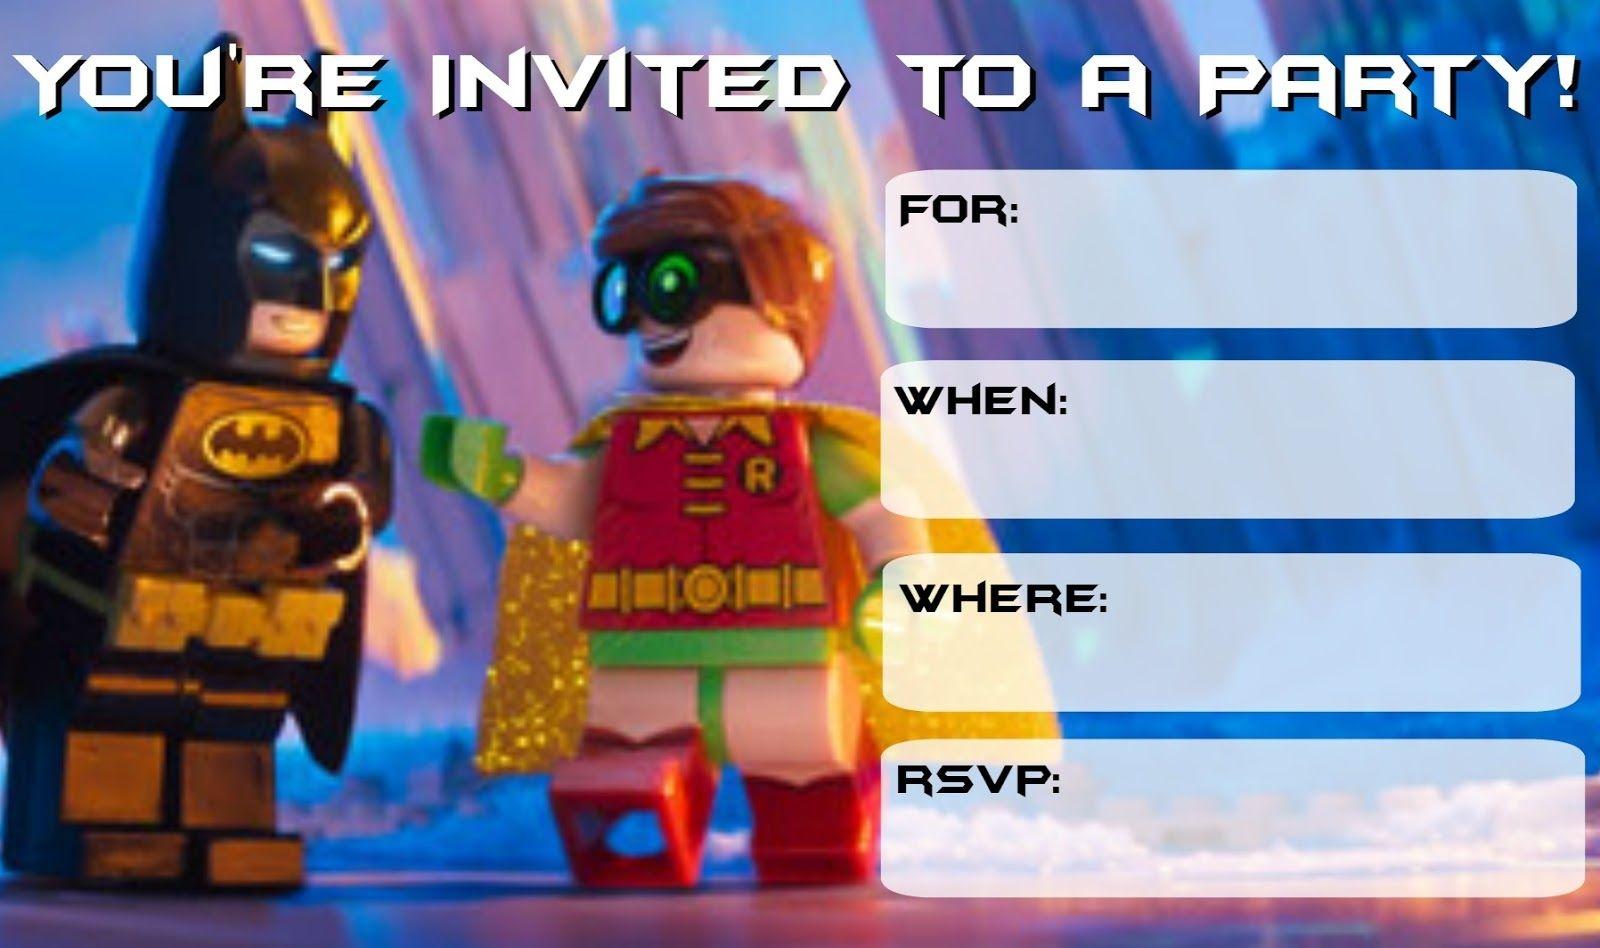 More Lego Batman Party Invitations   Drew's Birthday   Lego Batman - Lego Batman Invitations Free Printable